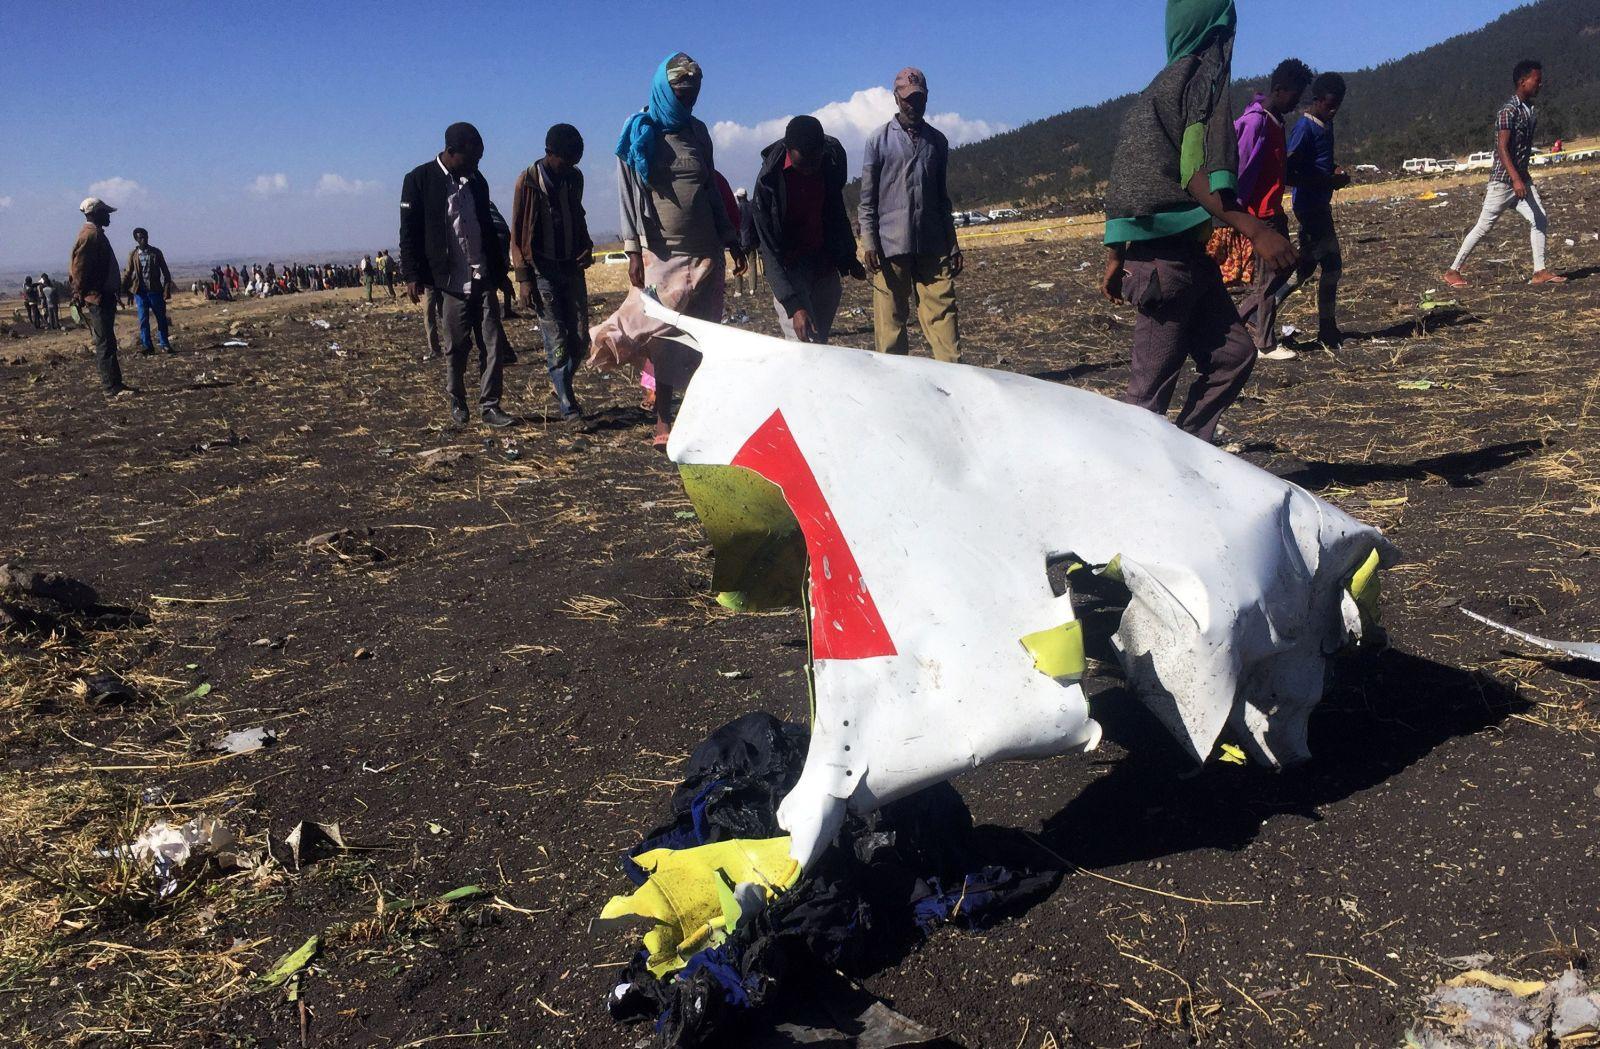 https___cdn.cnn.com_cnnnext_dam_assets_190310095742-05-ethiopia-plane-crash